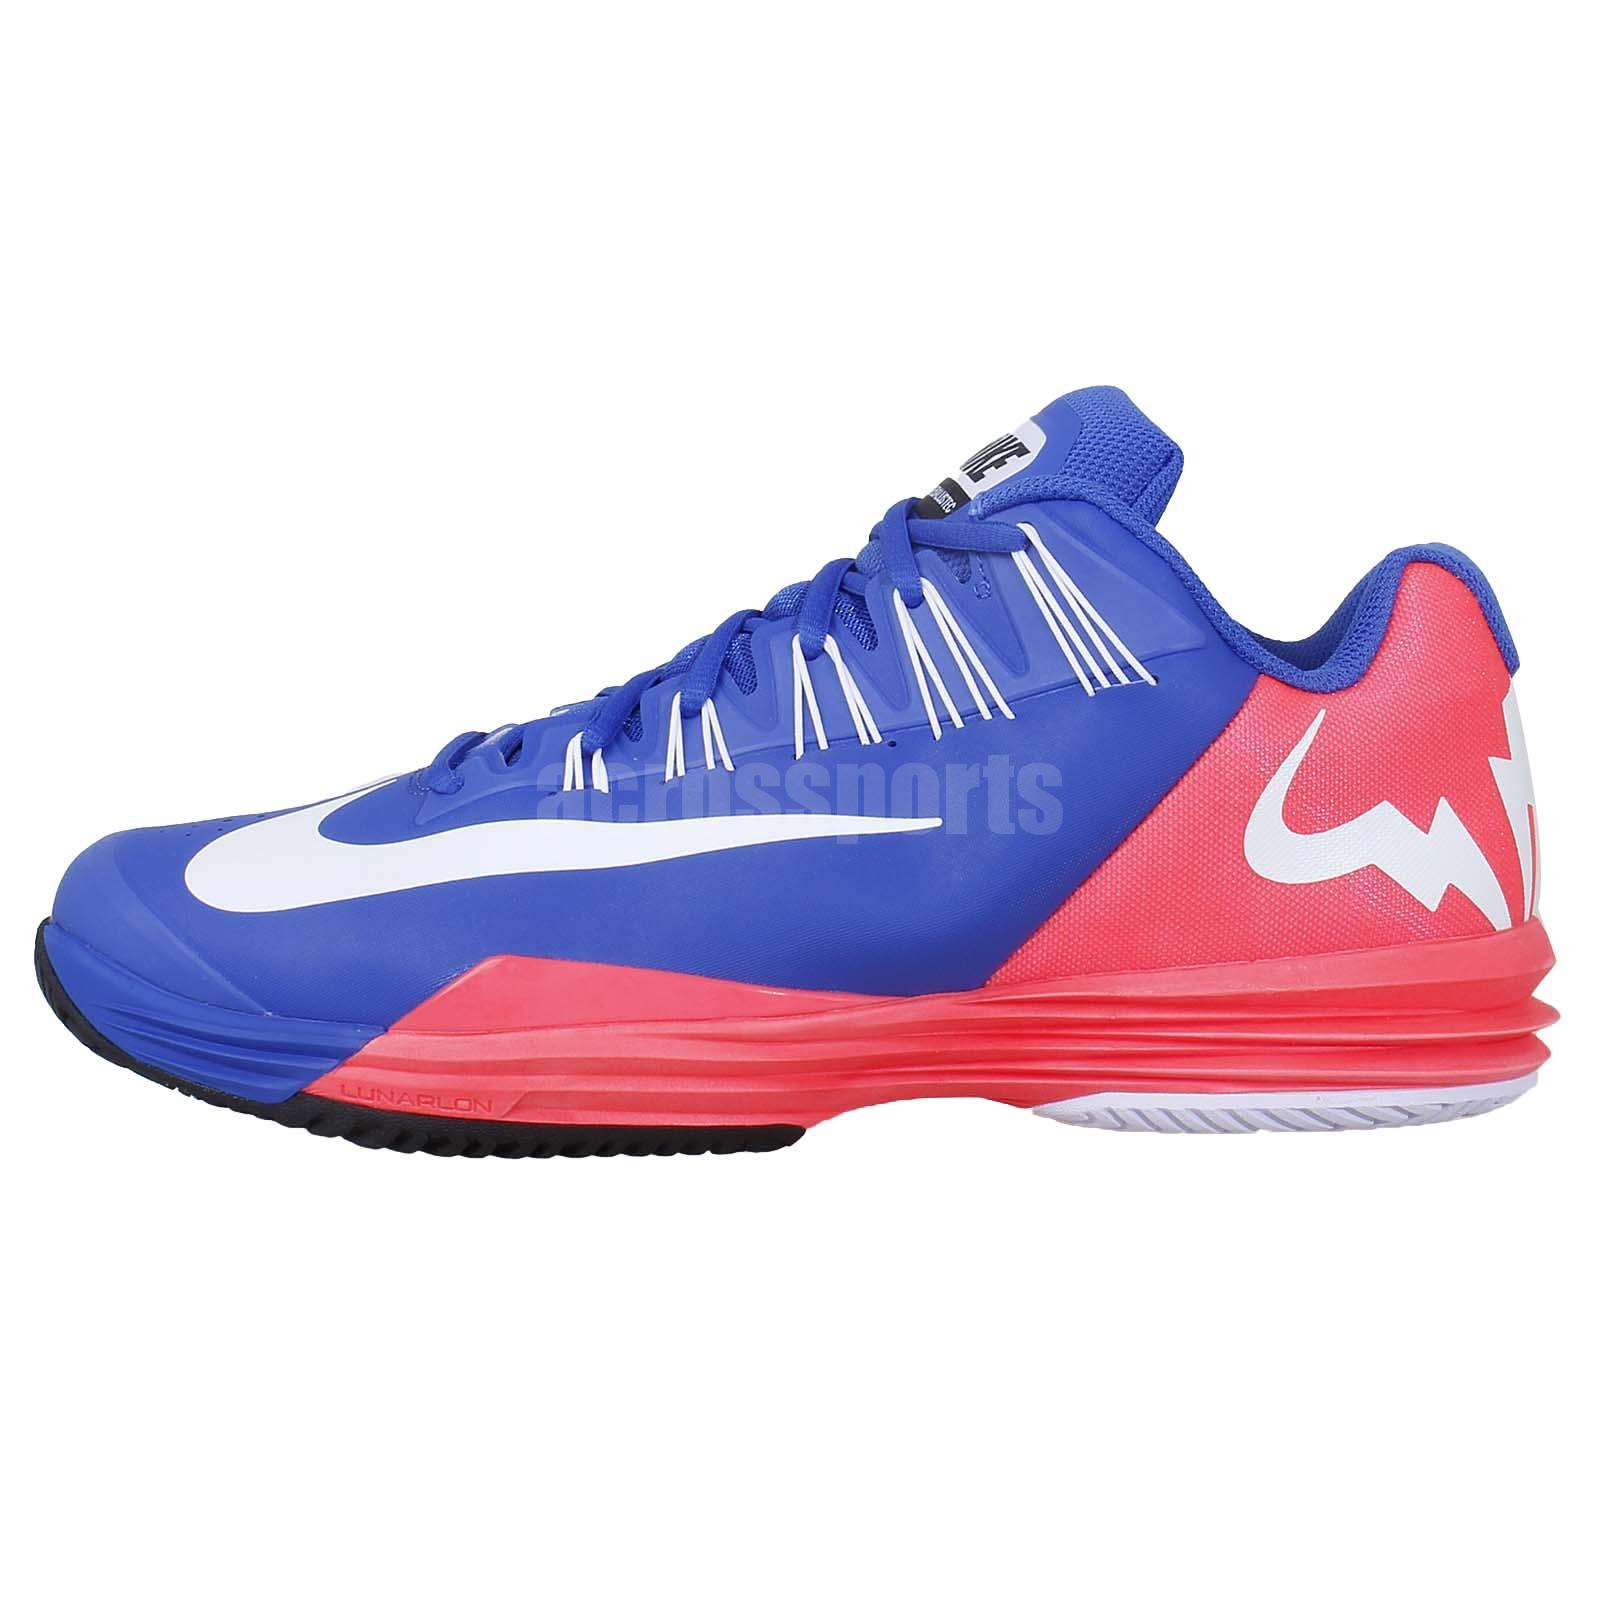 Nike Lunar Ballistec Rafael Nadal Blue Pink 2014 New Mens ...